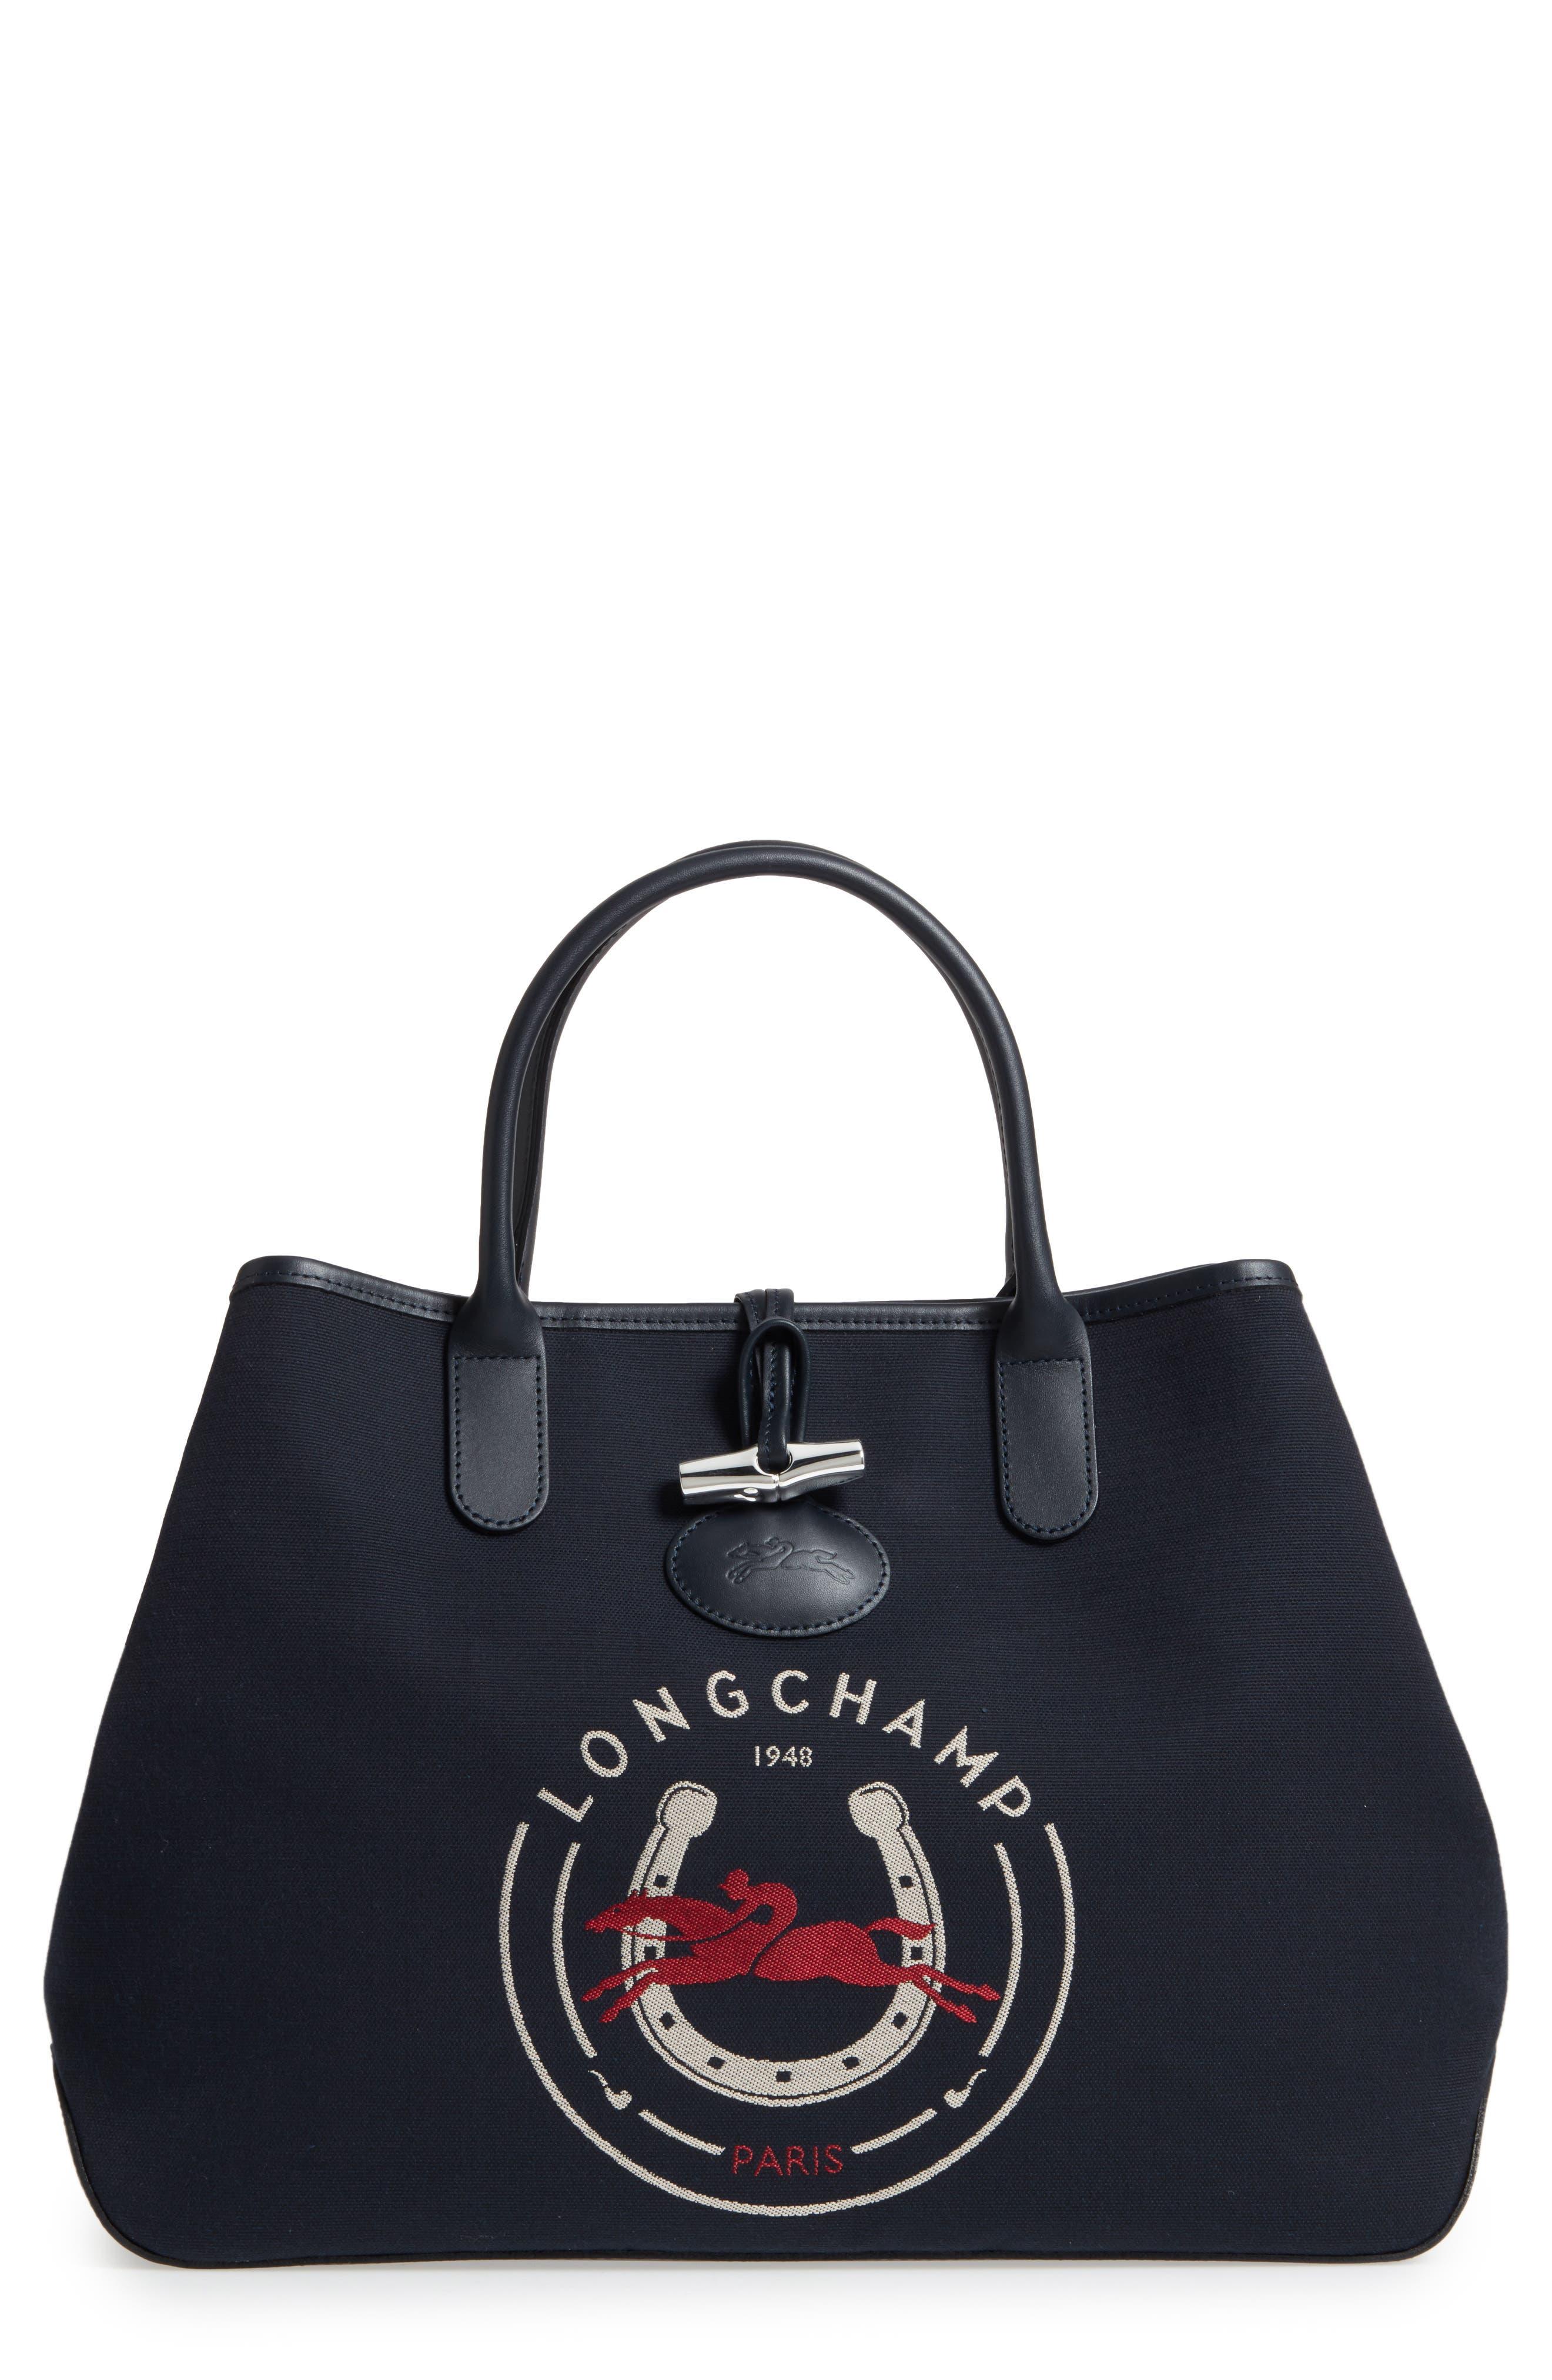 Longchamp Roseau 1948 Tote